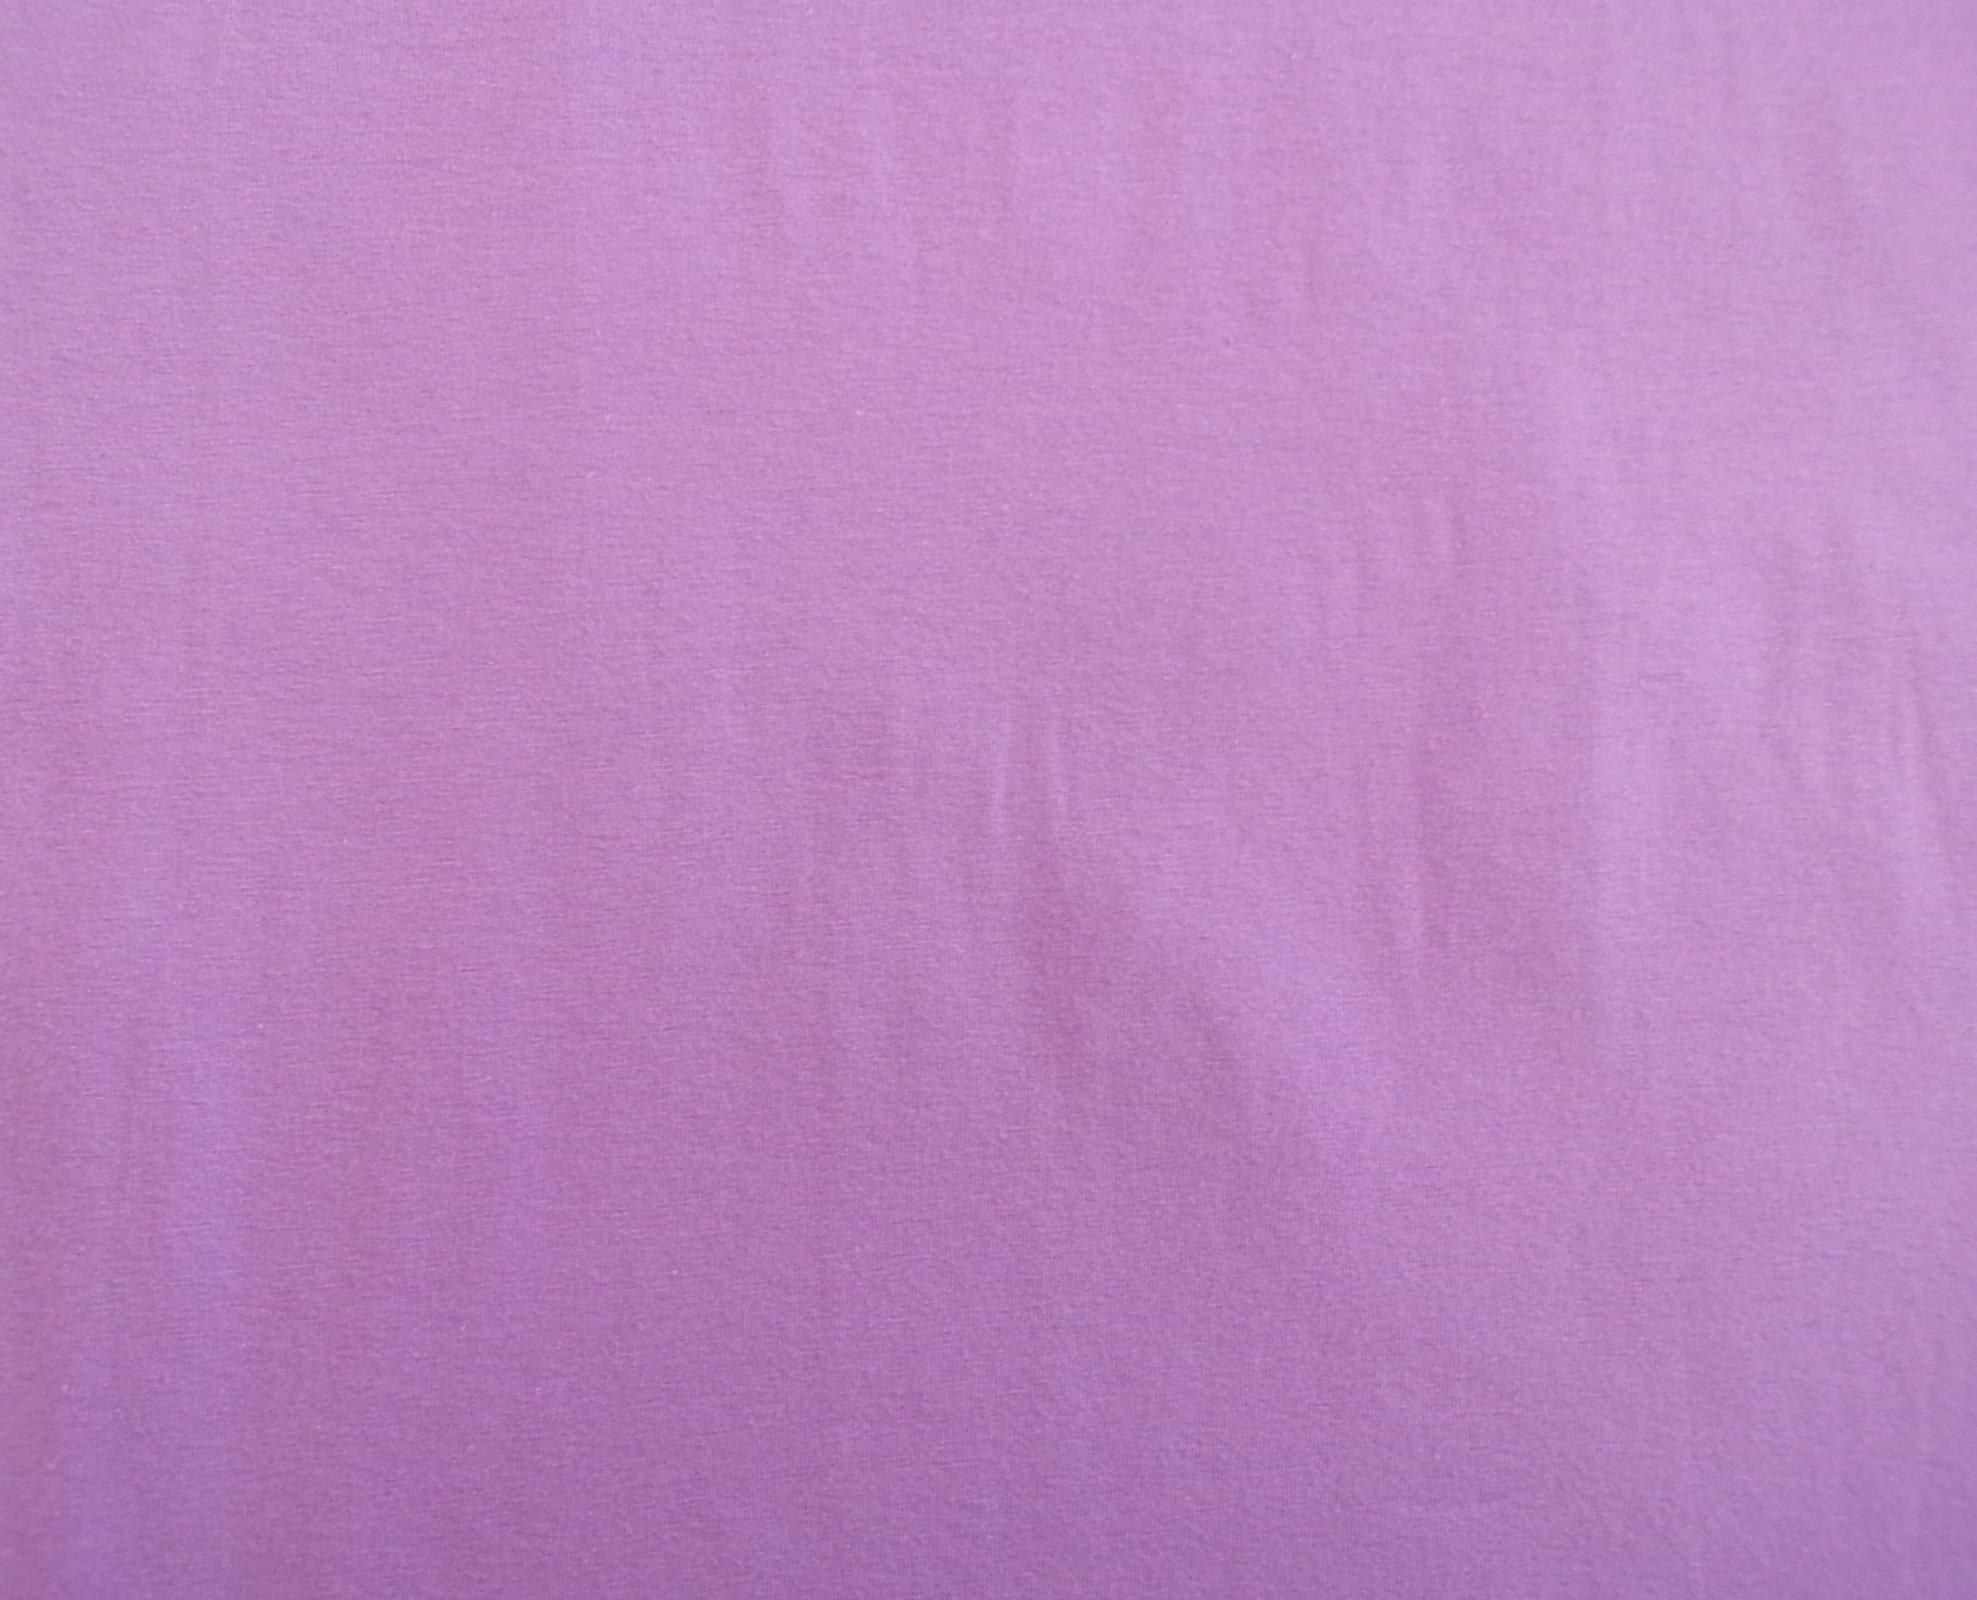 Cotton Lycra Jersey - Lavendar